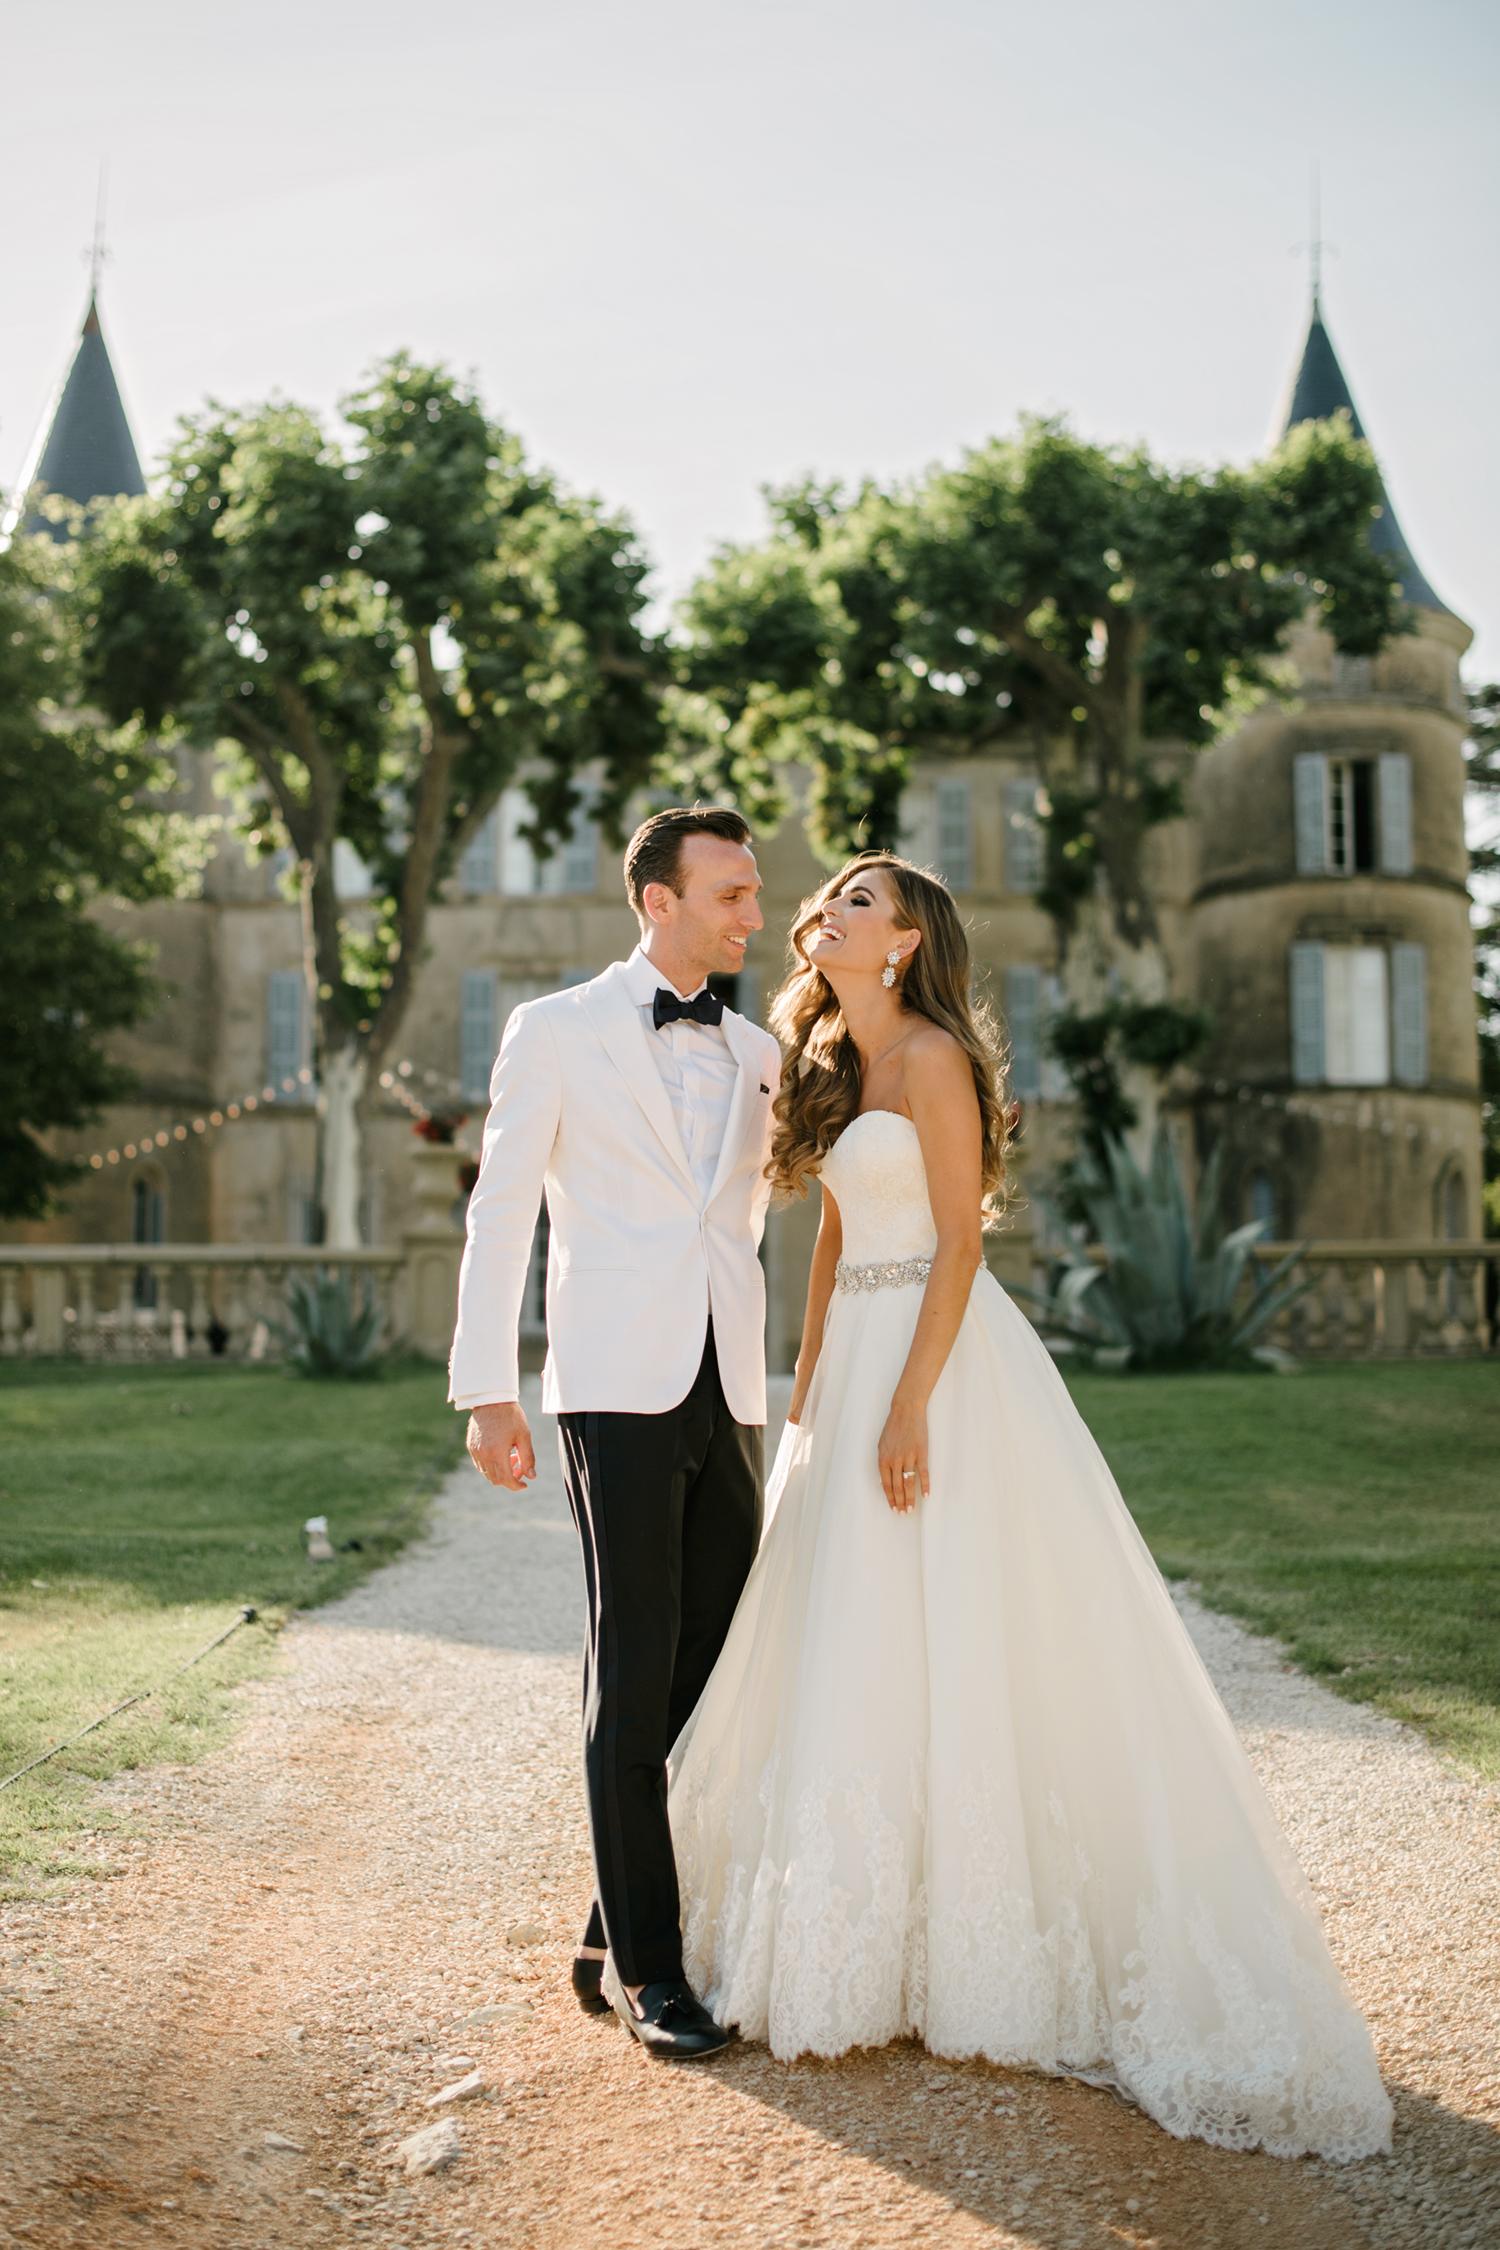 Chateau-Robernier-Wedding-Photographer-0126.jpg